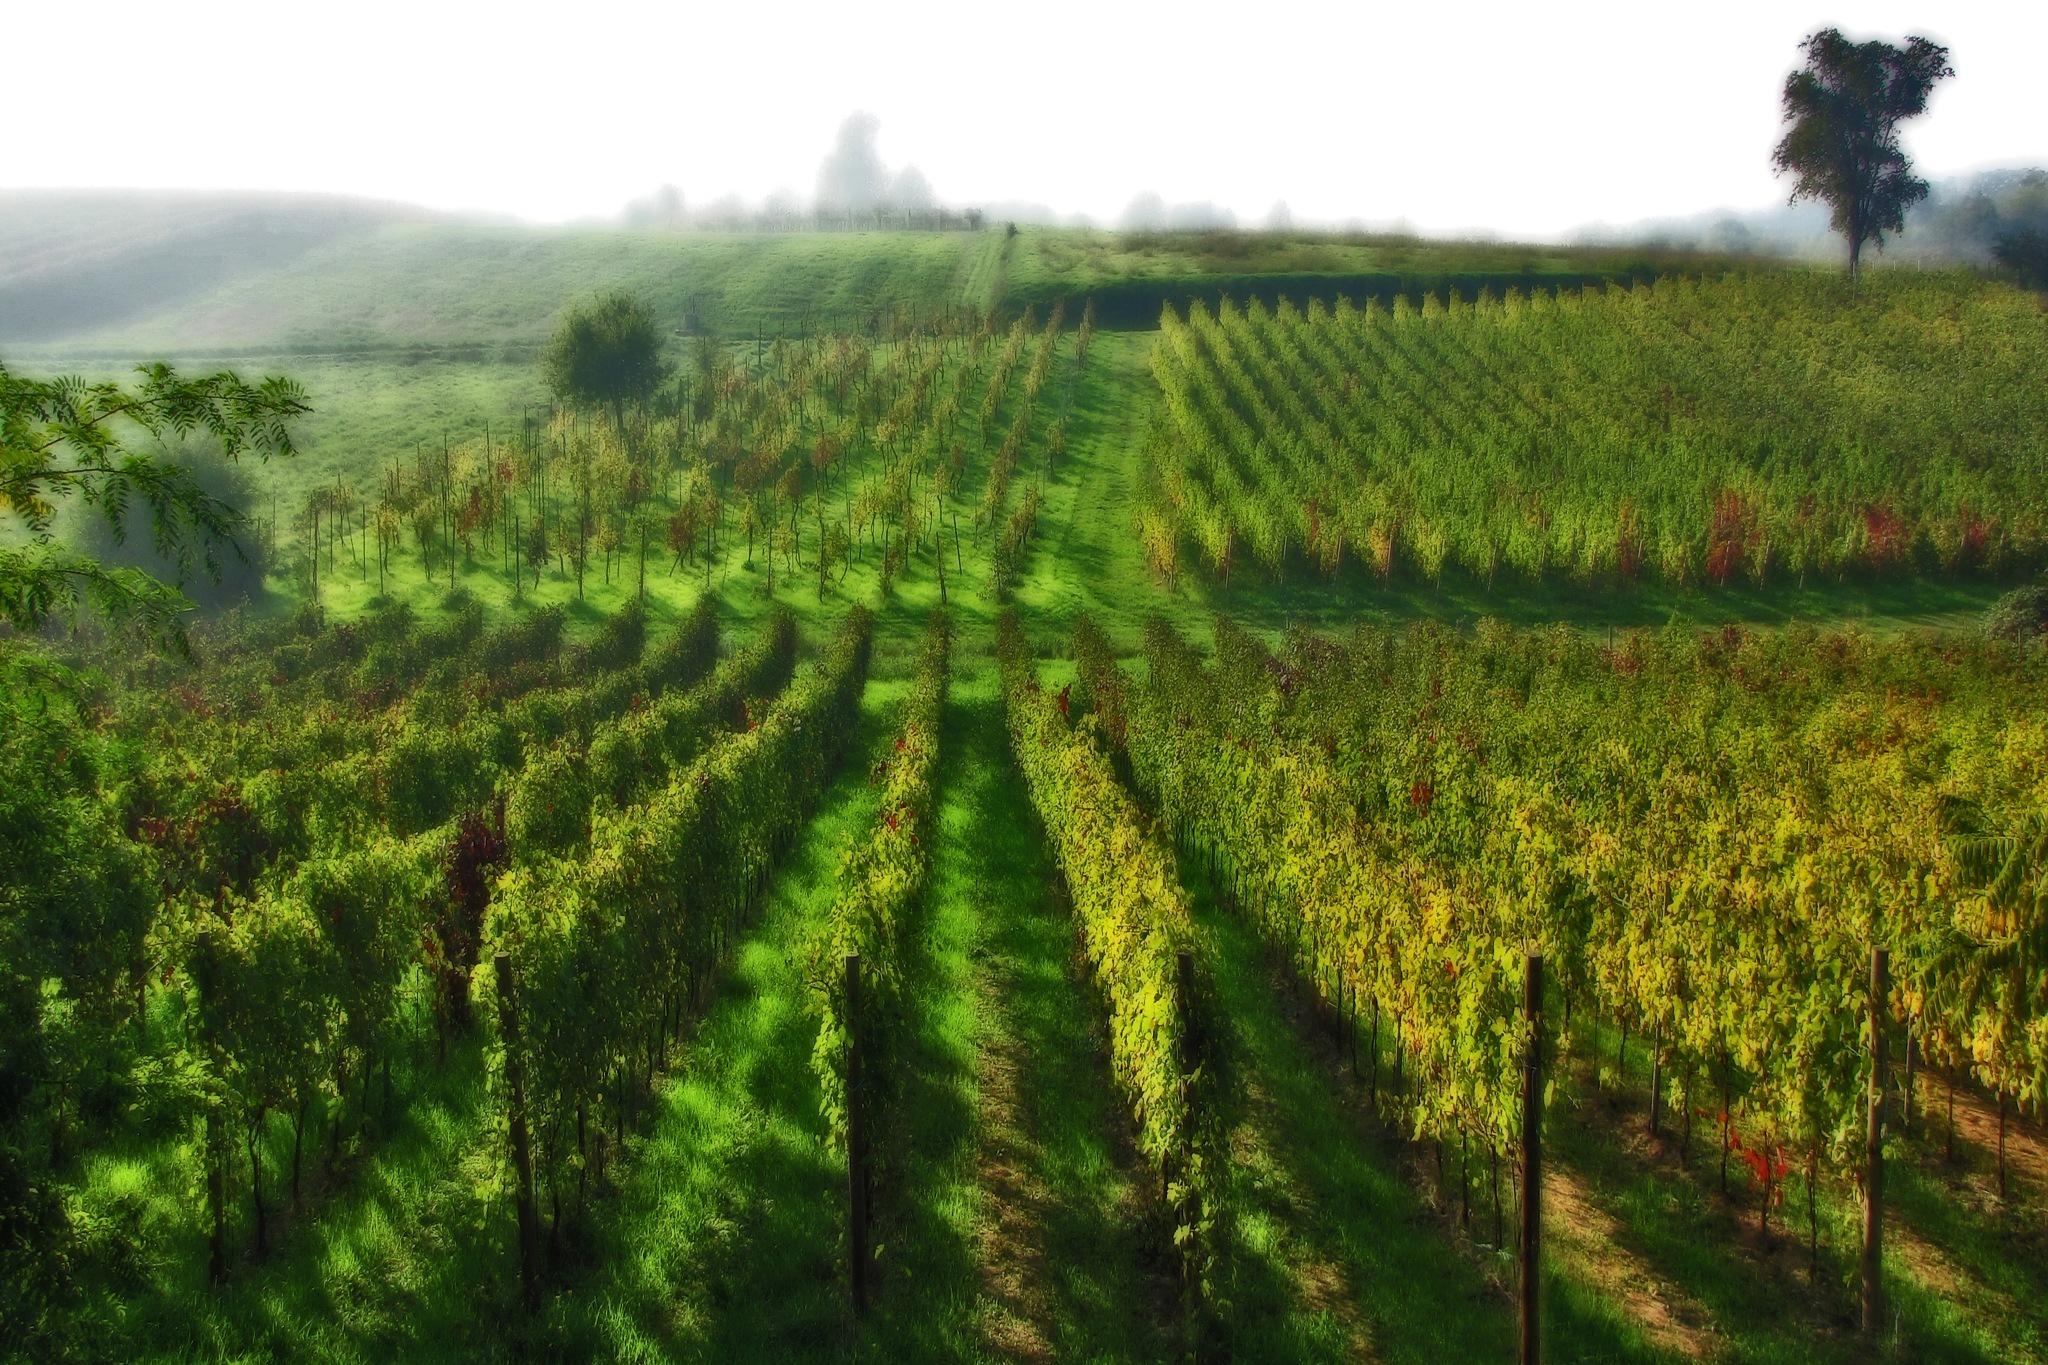 Vineyard by Pietro Sangalli